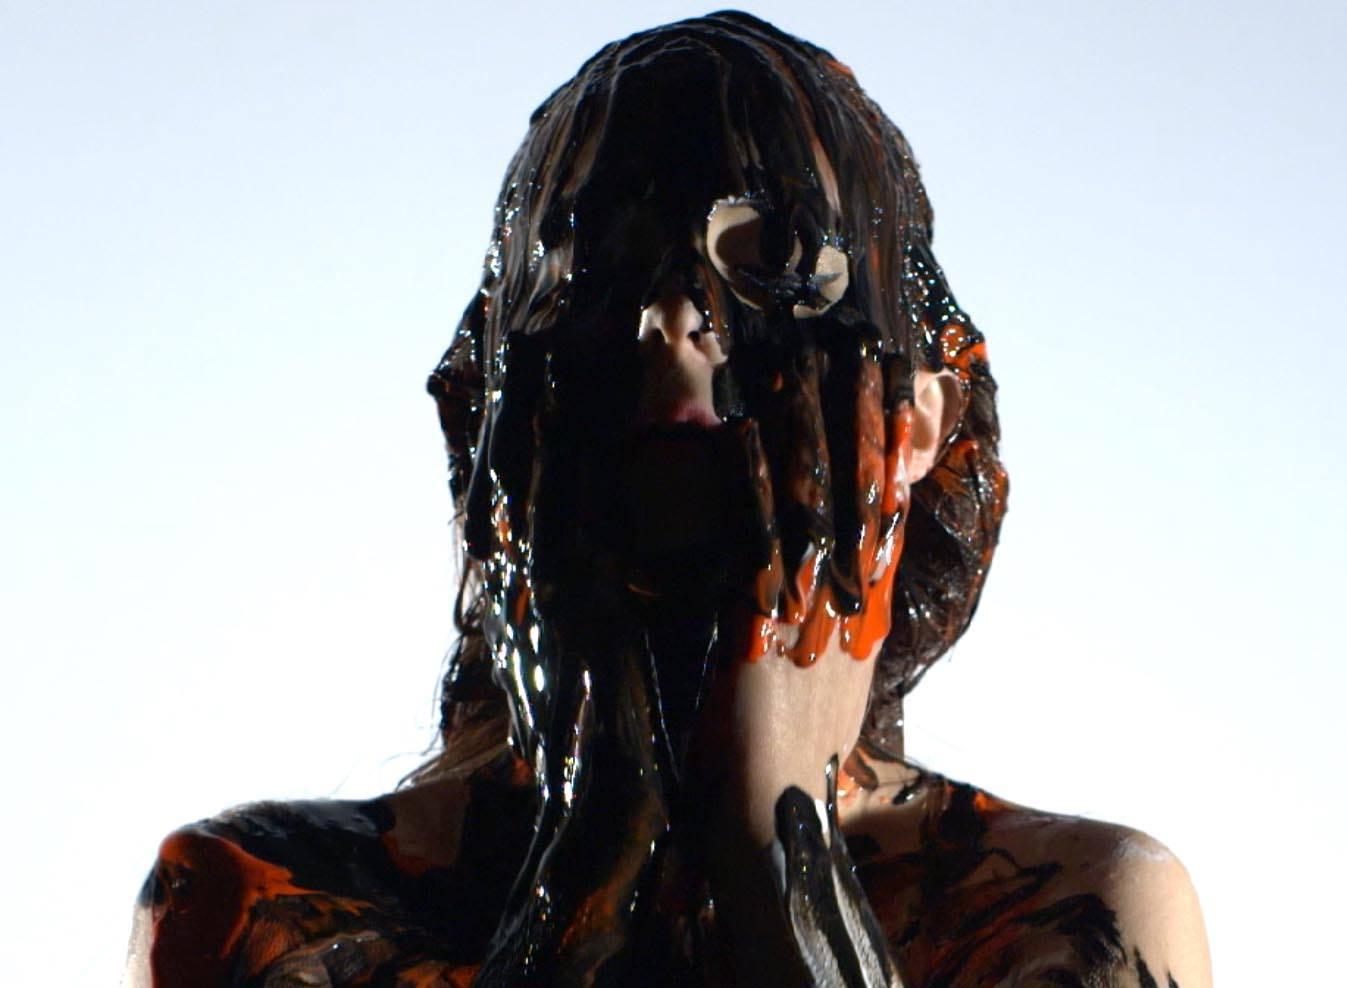 Oscar & Deon – Killer (Official Music Video) [Avant/Garde]